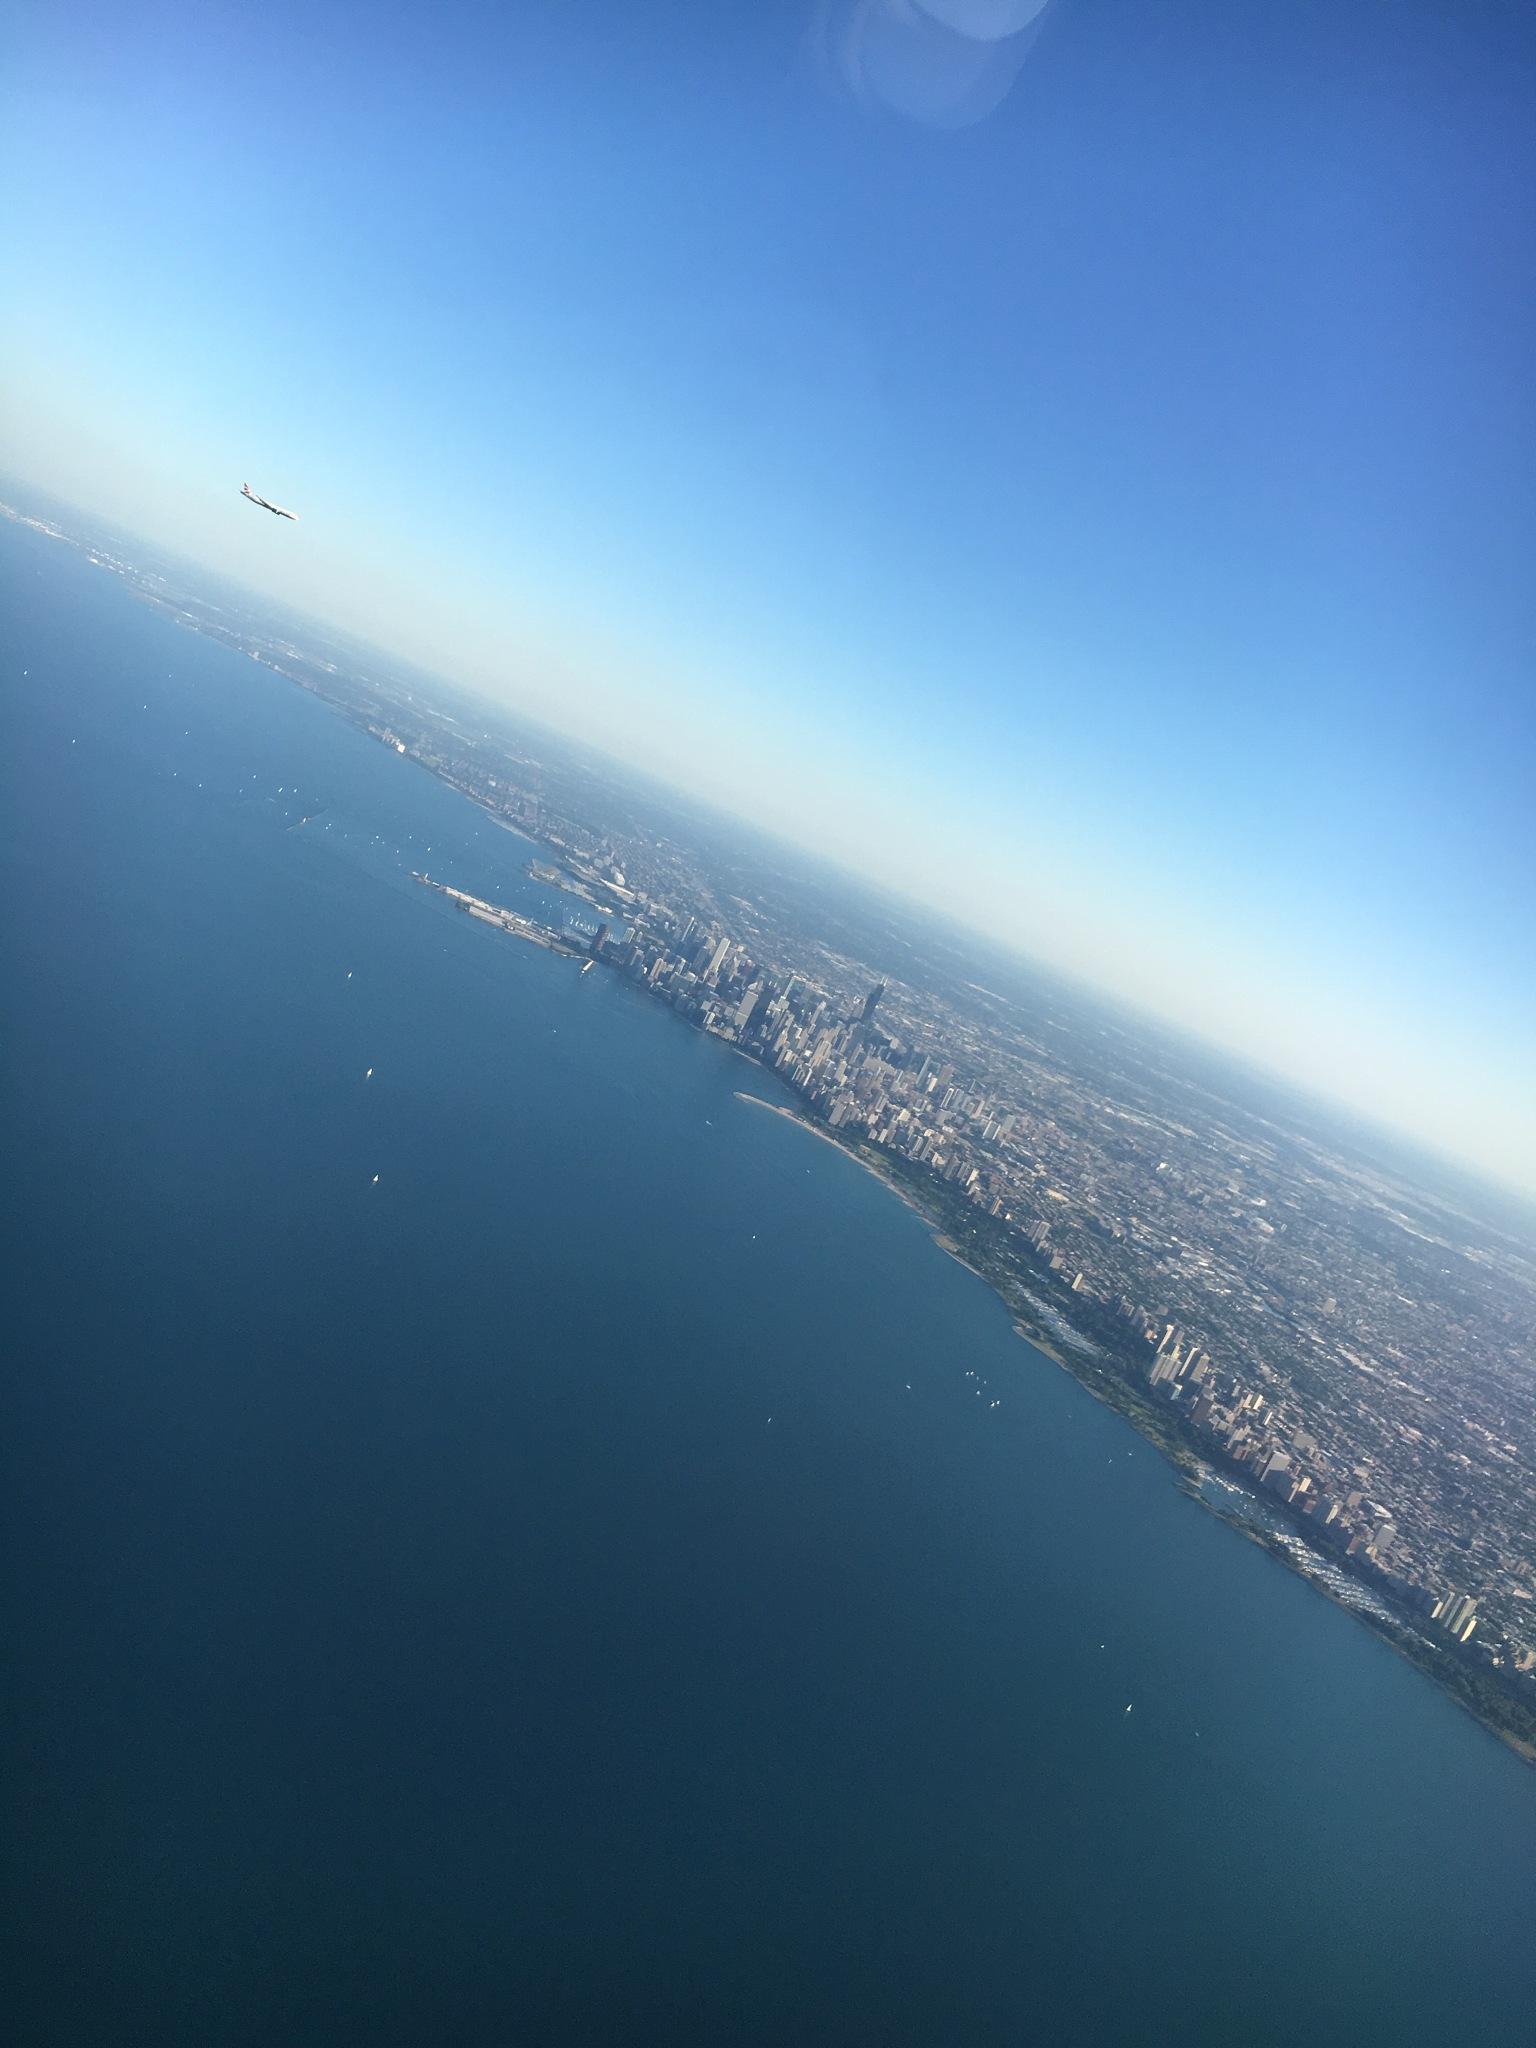 Landing in Chicago -photo taken from plane- by hazemalwajeeh13